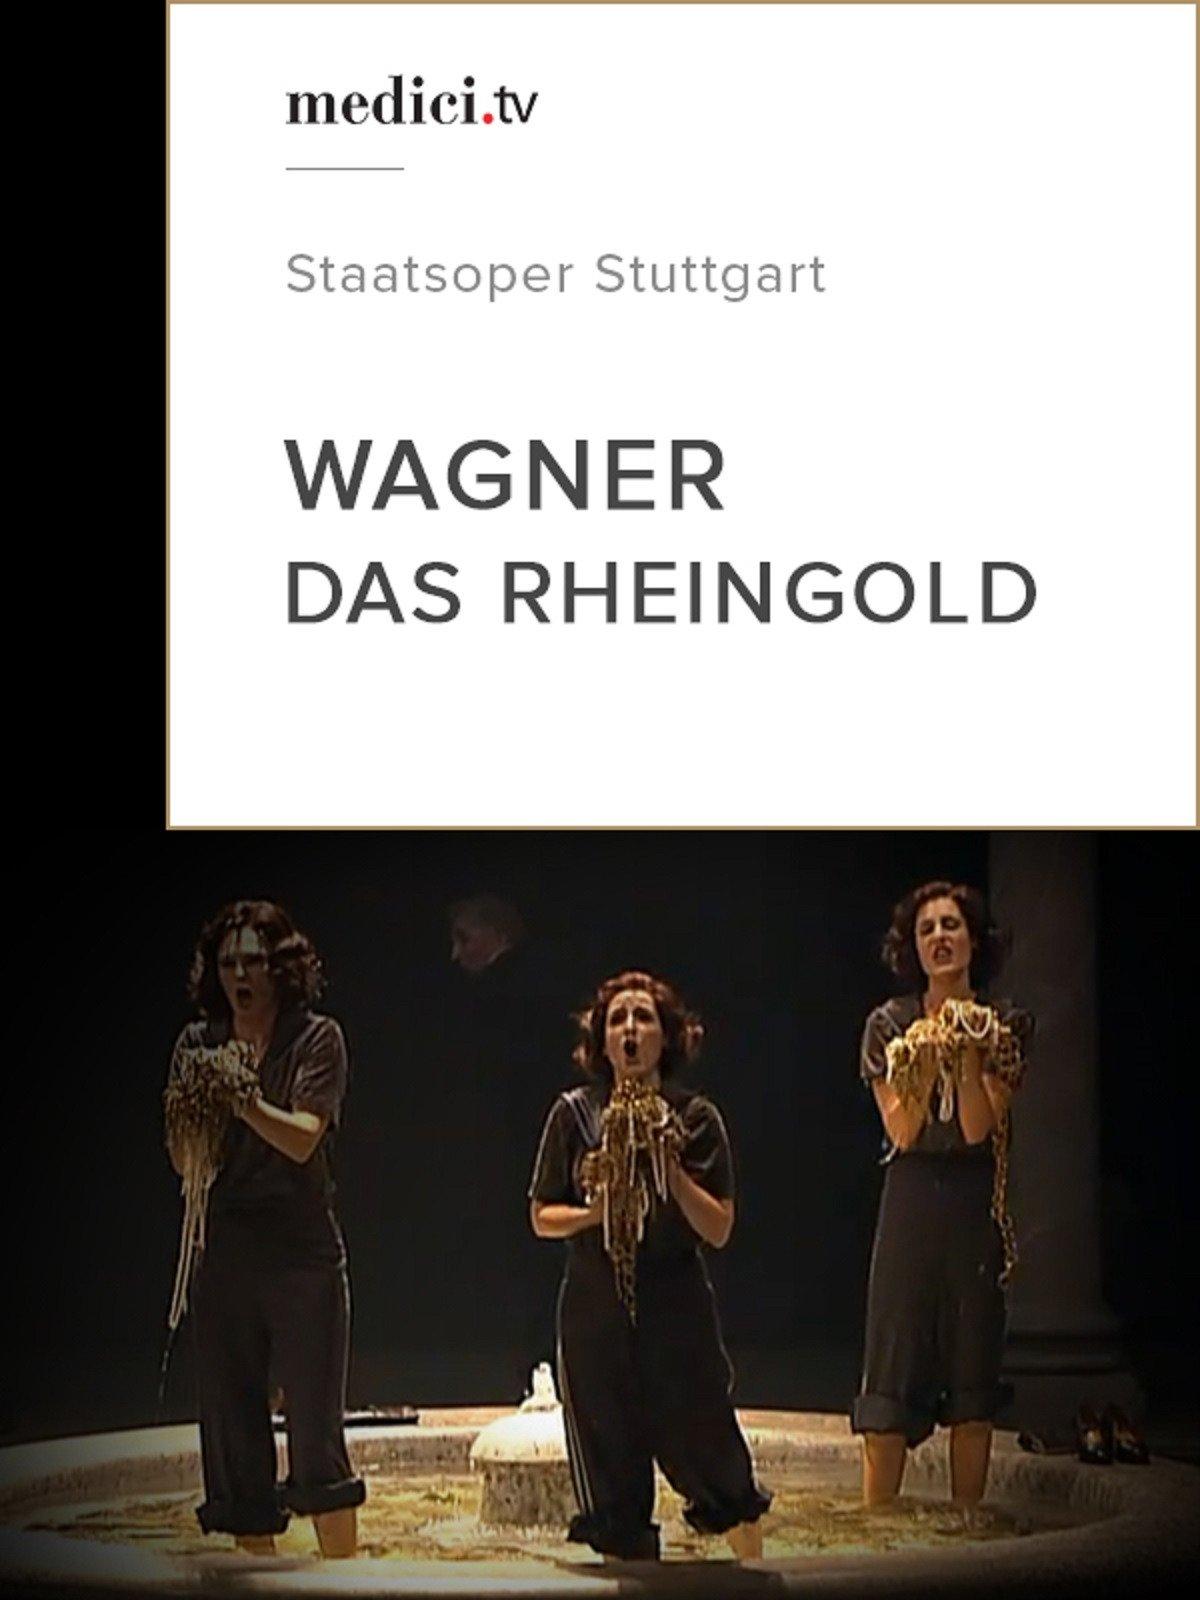 Wagner, Das Rheingold